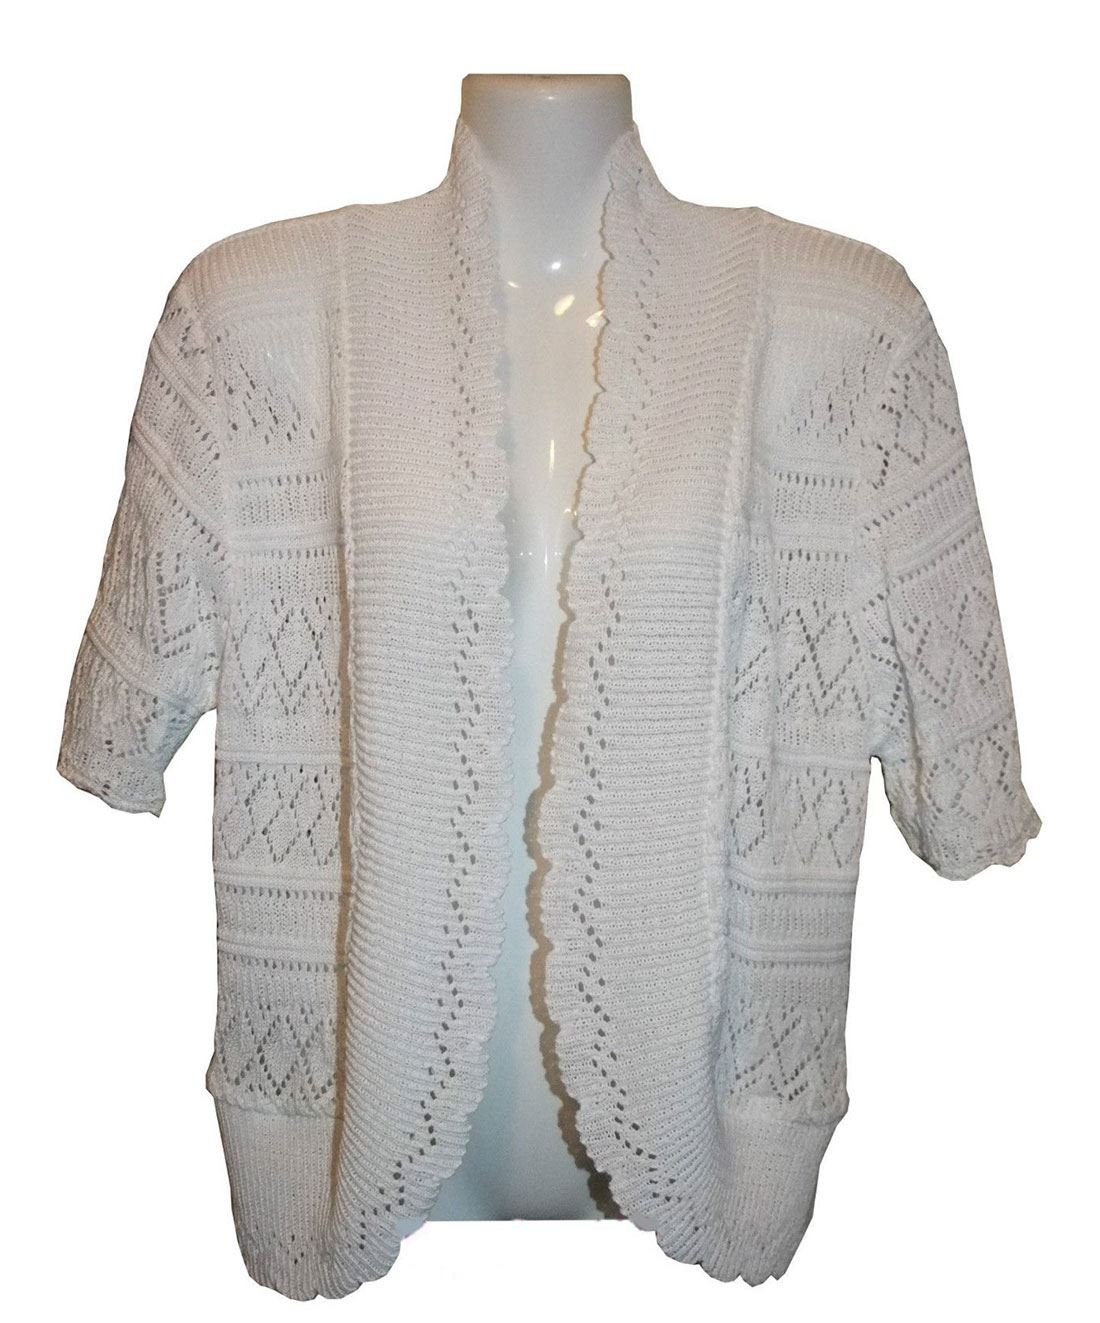 Rimi Hanger Women Long Sleeve Diamond Crochet Knited Cardigan US 12-28